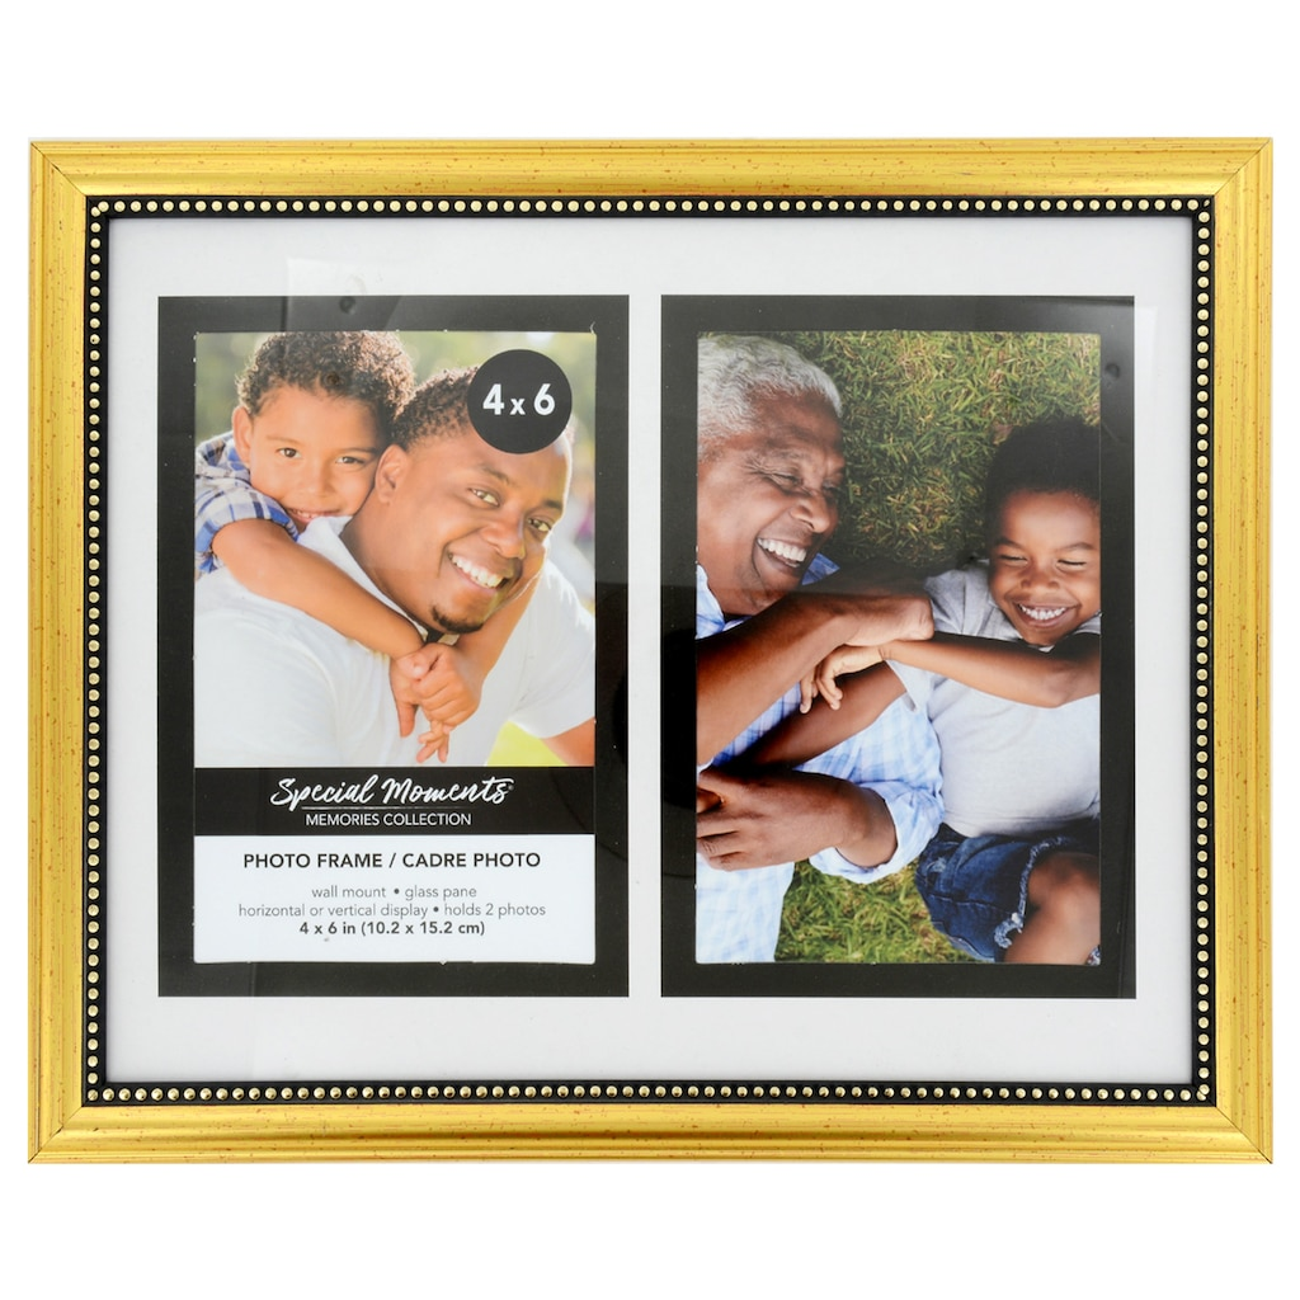 5bff61ec4098 4x6 Plastic Picture Frames - Dollar Tree